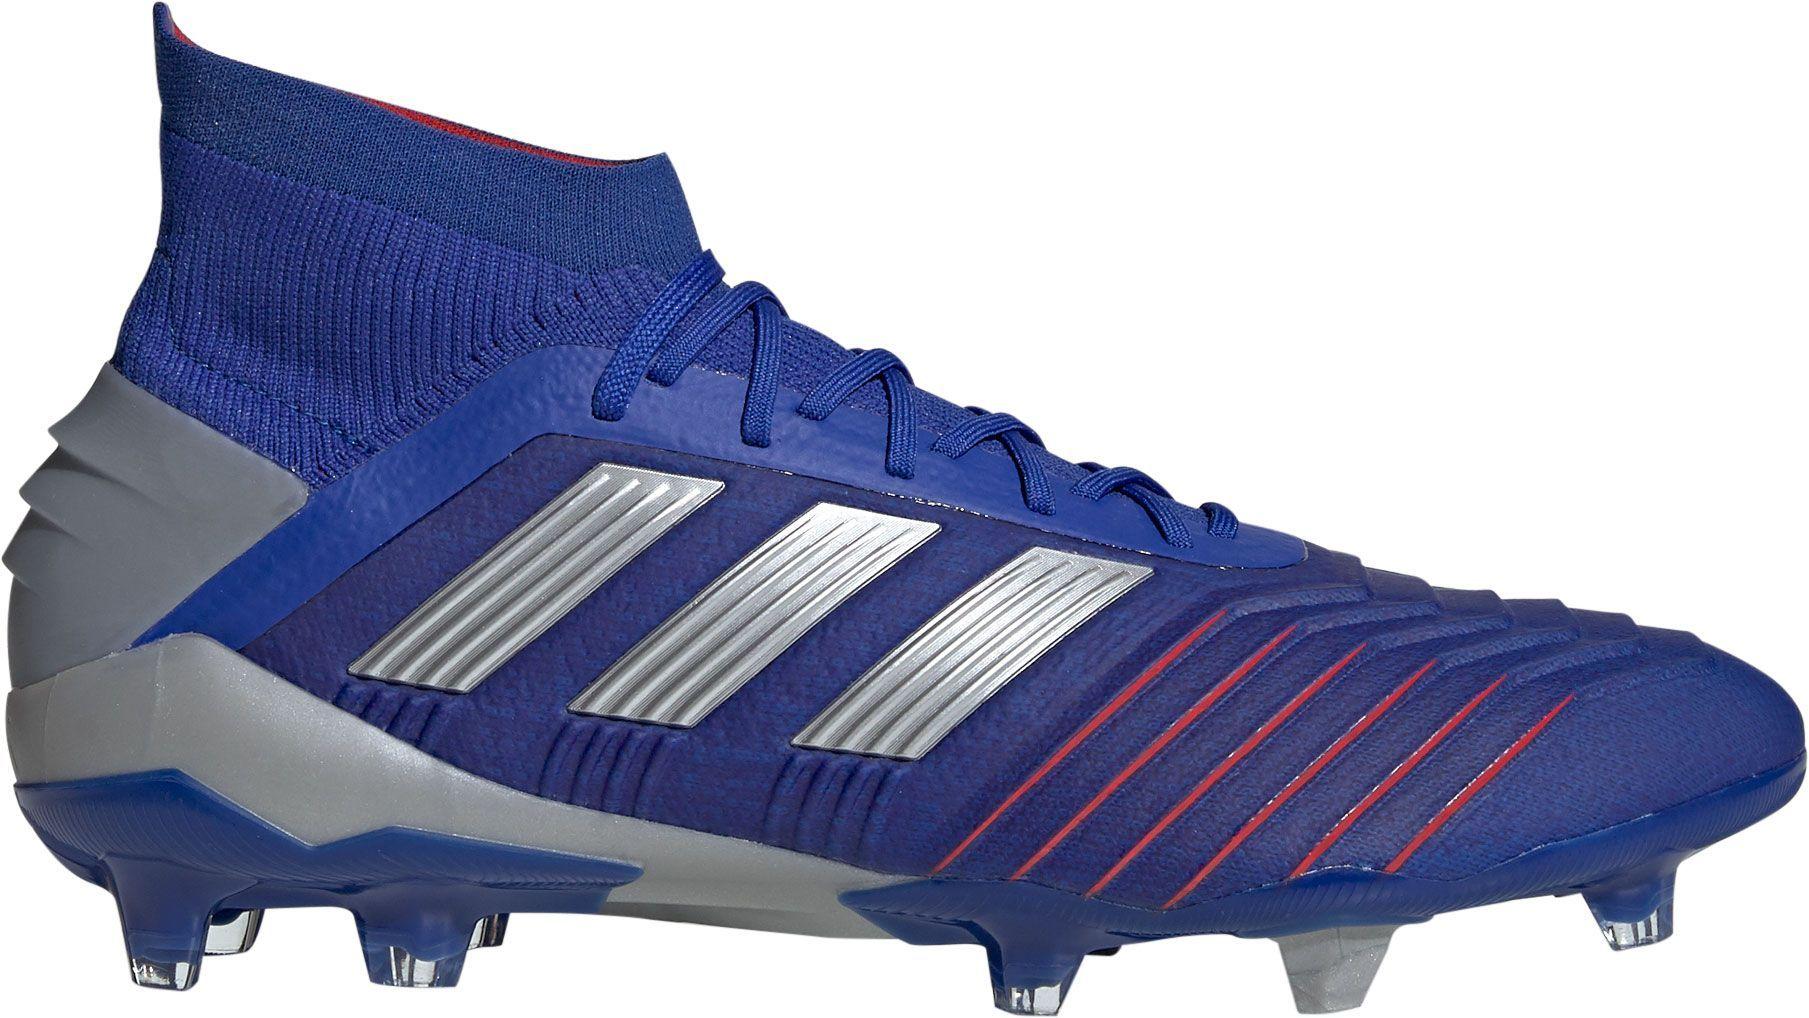 Predator 19.1 FG Soccer Cleats